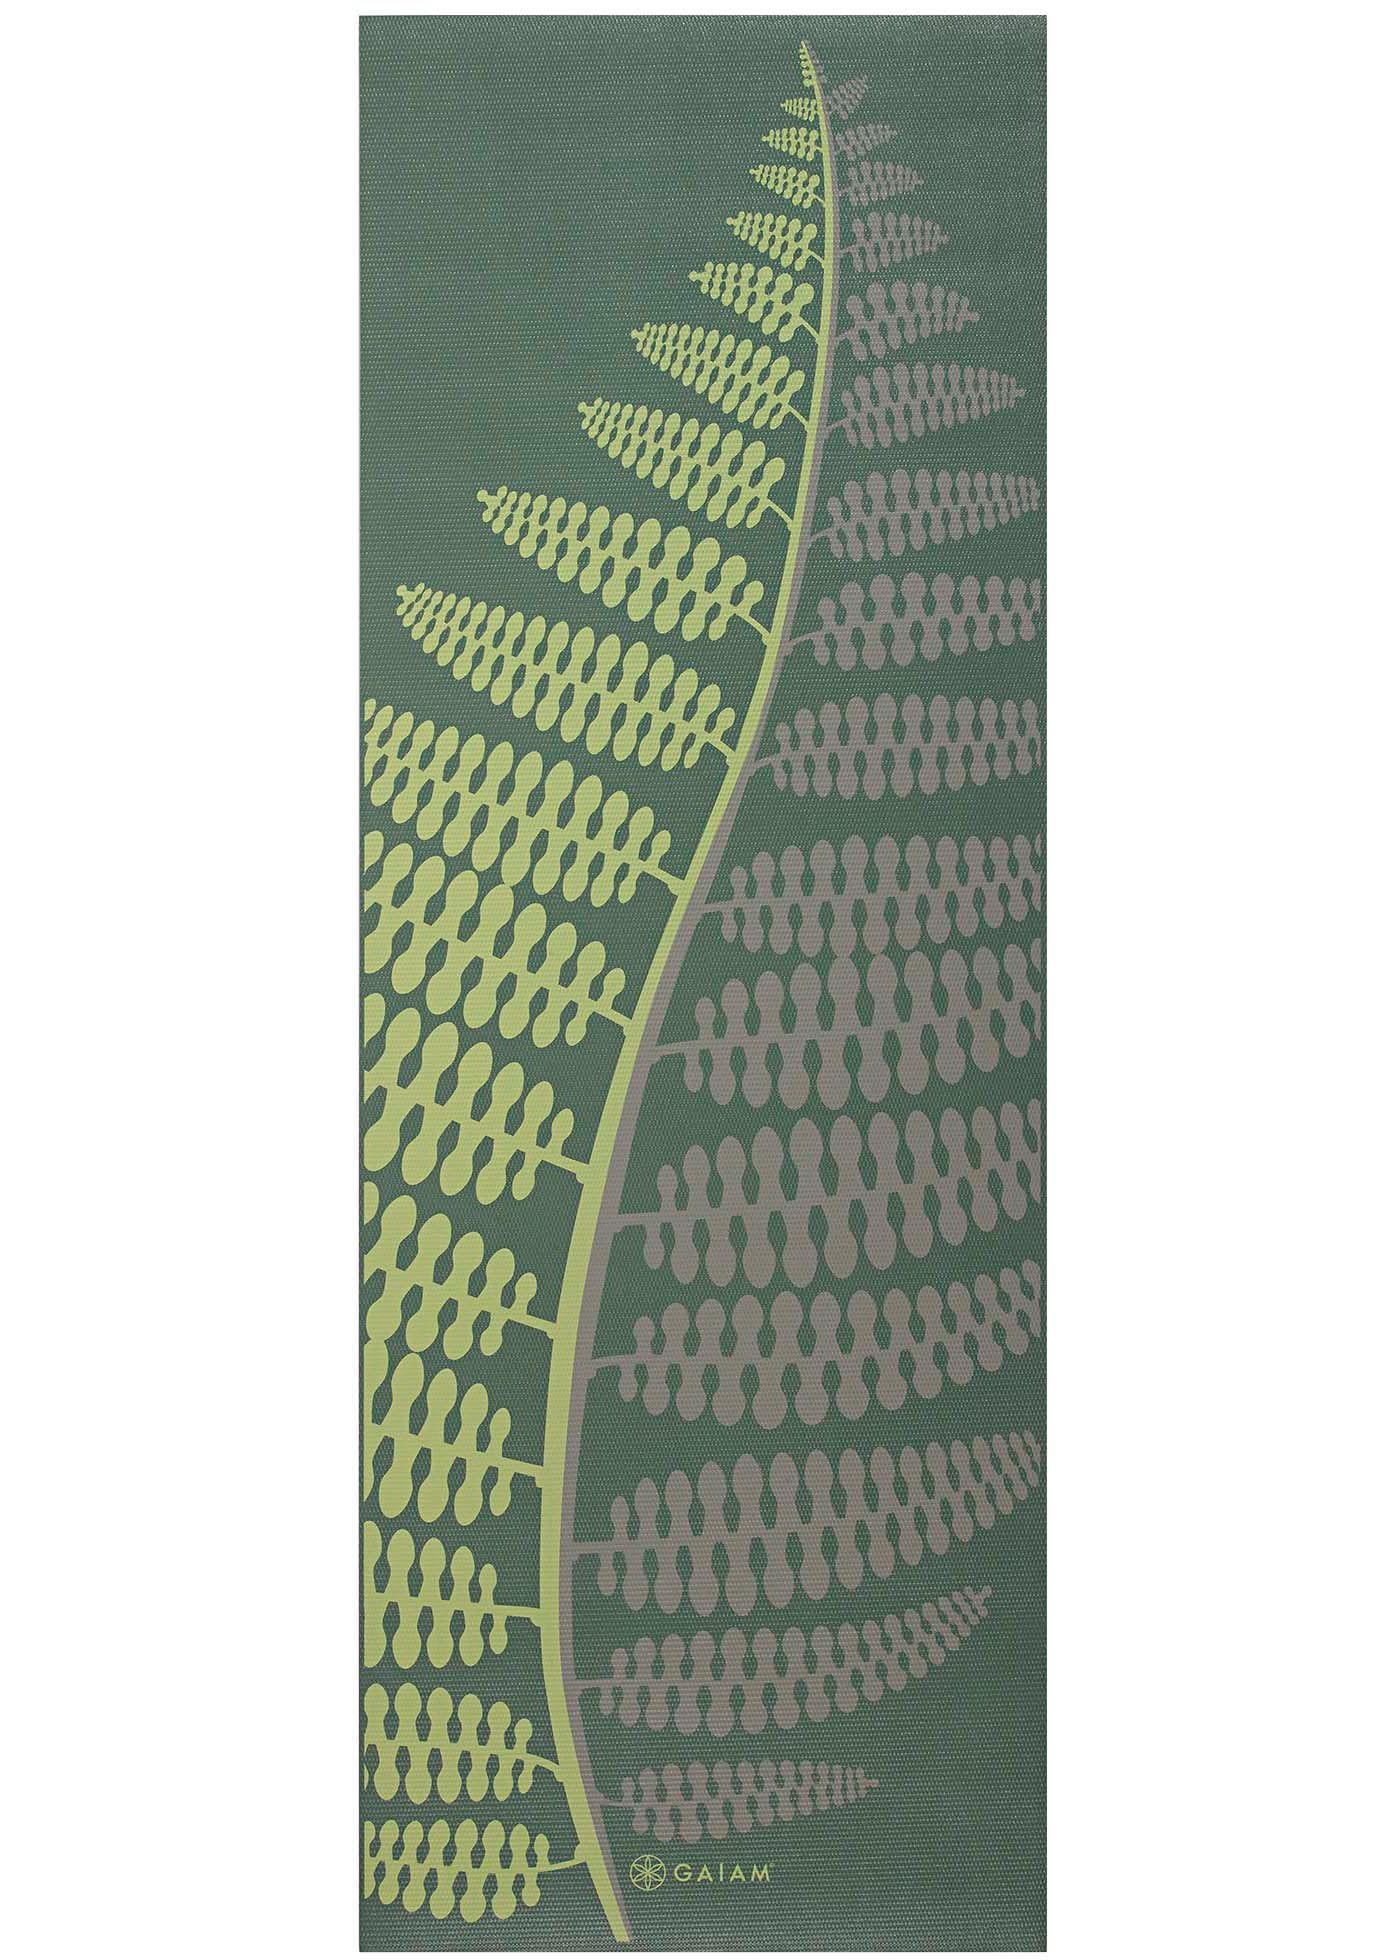 Gaiam Classic 6mm Yoga Mat